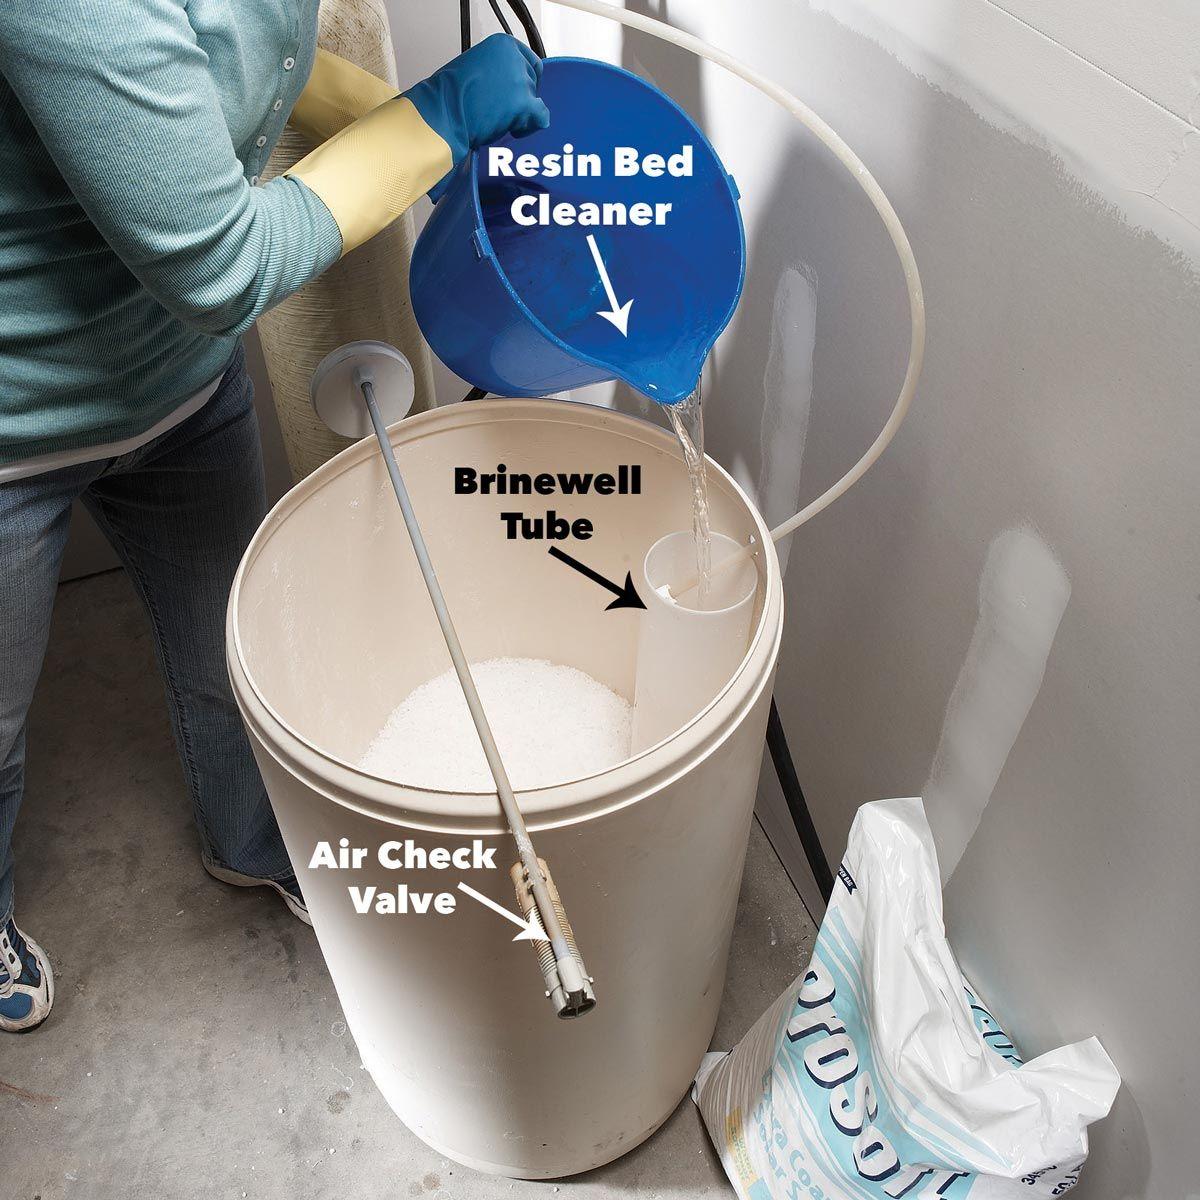 Fix A Water Softener In 2020 Water Softener Water Softener Salt